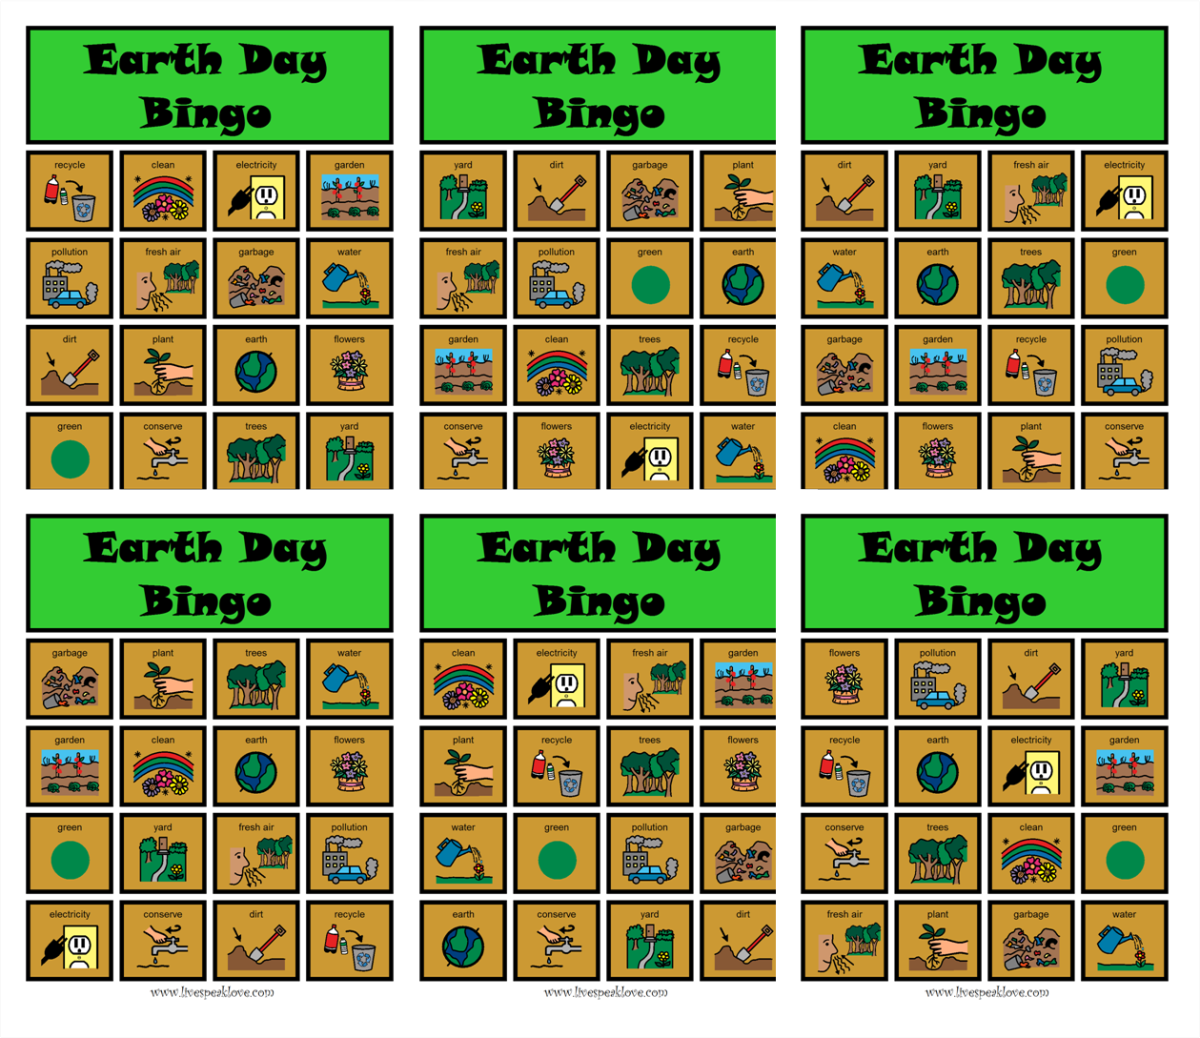 Earth Day Bingo Boards